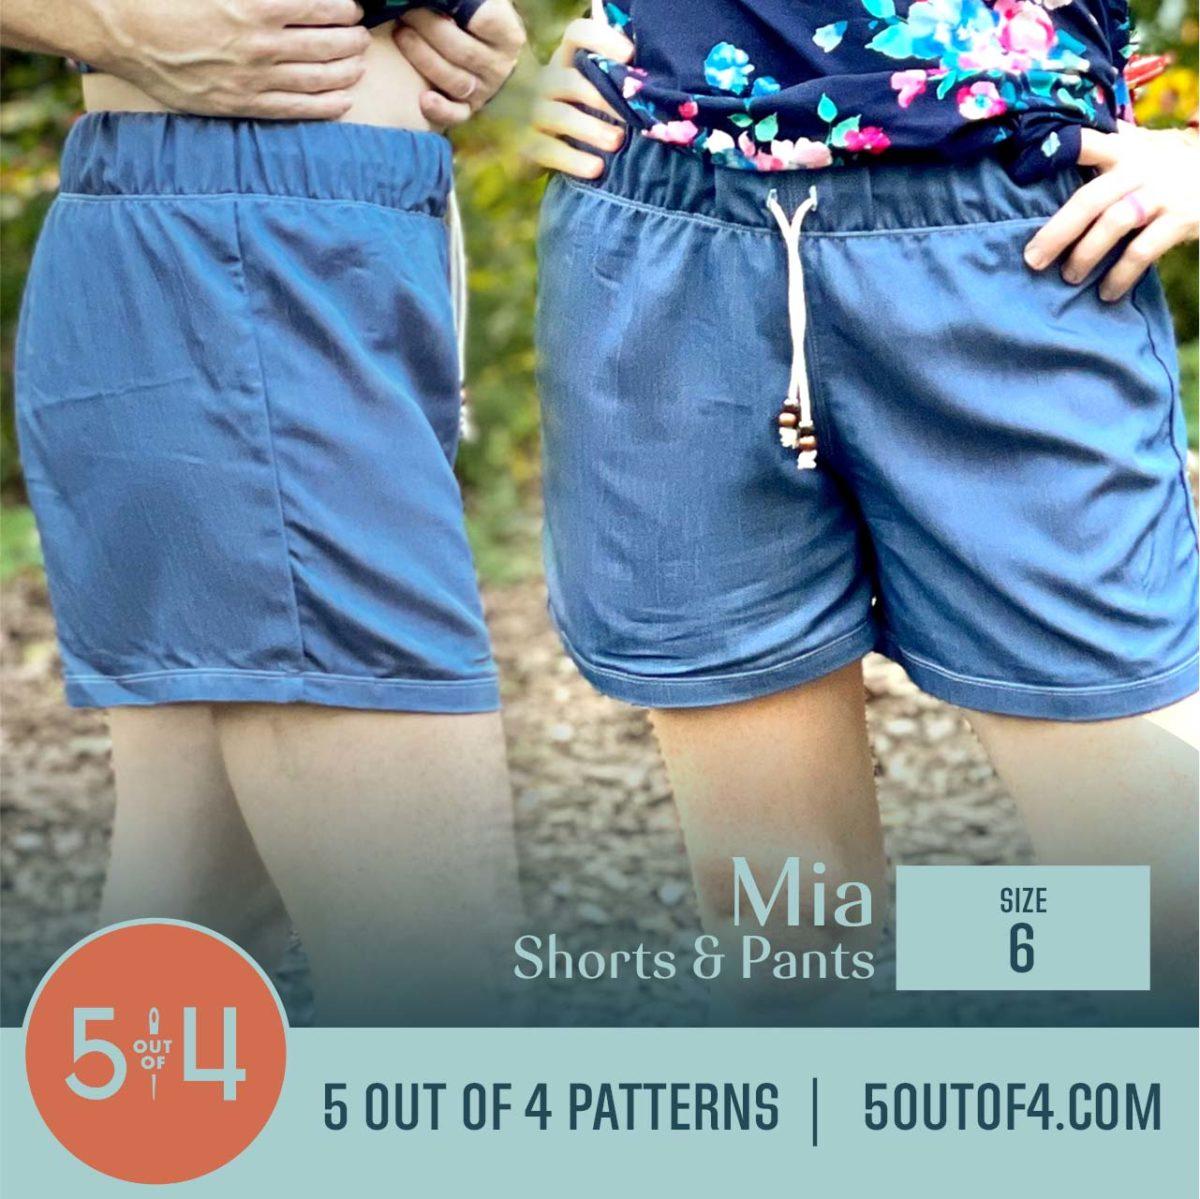 5oo4 Patterns Mia Pants size 6